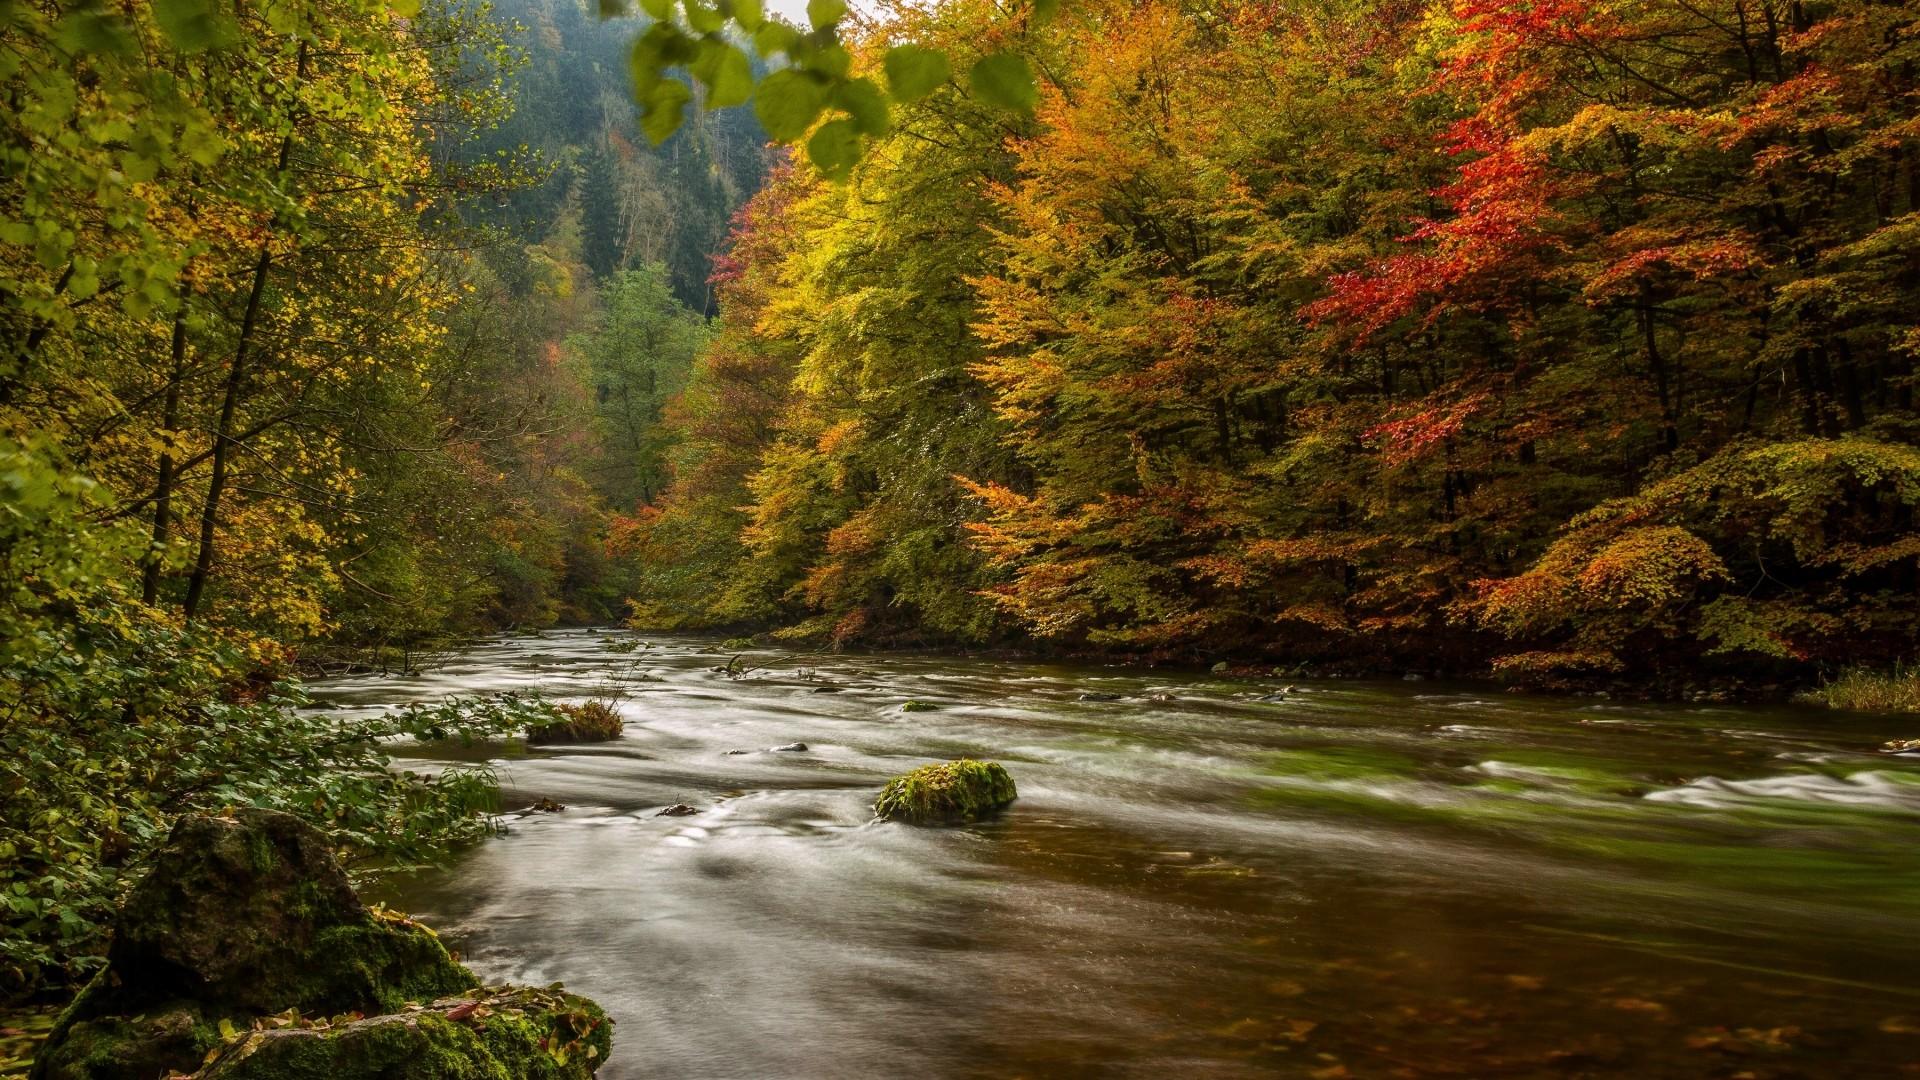 Fall Leaves Ipad Wallpaper Die 72 Besten Herbstlandschaft Hintergrundbilder